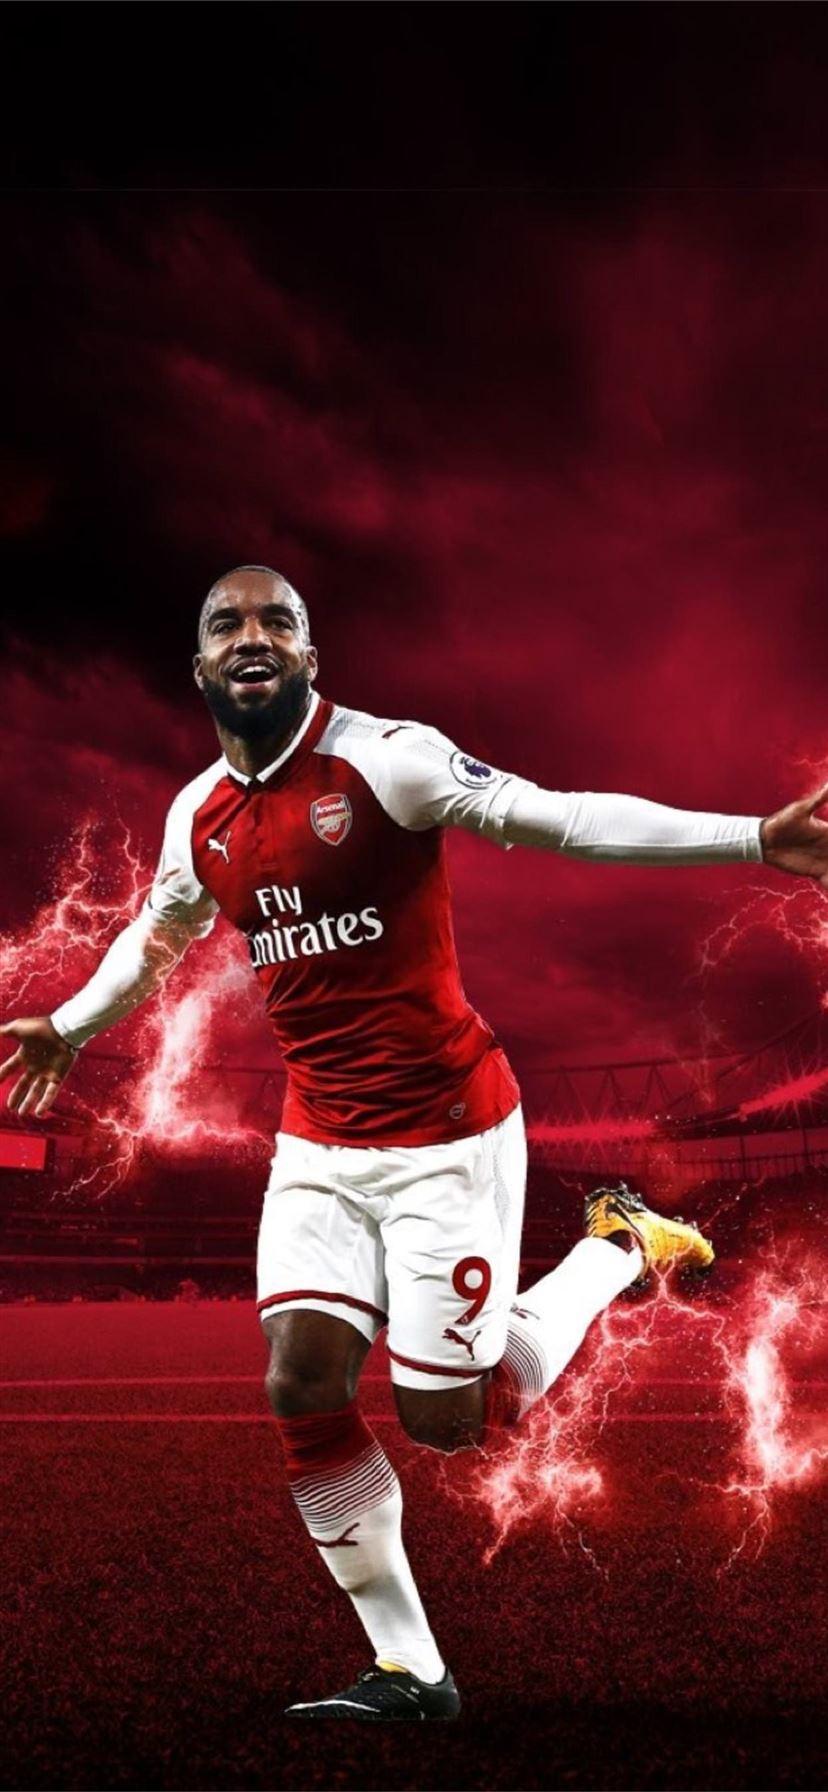 Arsenal Reddit Hd Football Iphone 11 Wallpapers Free Download